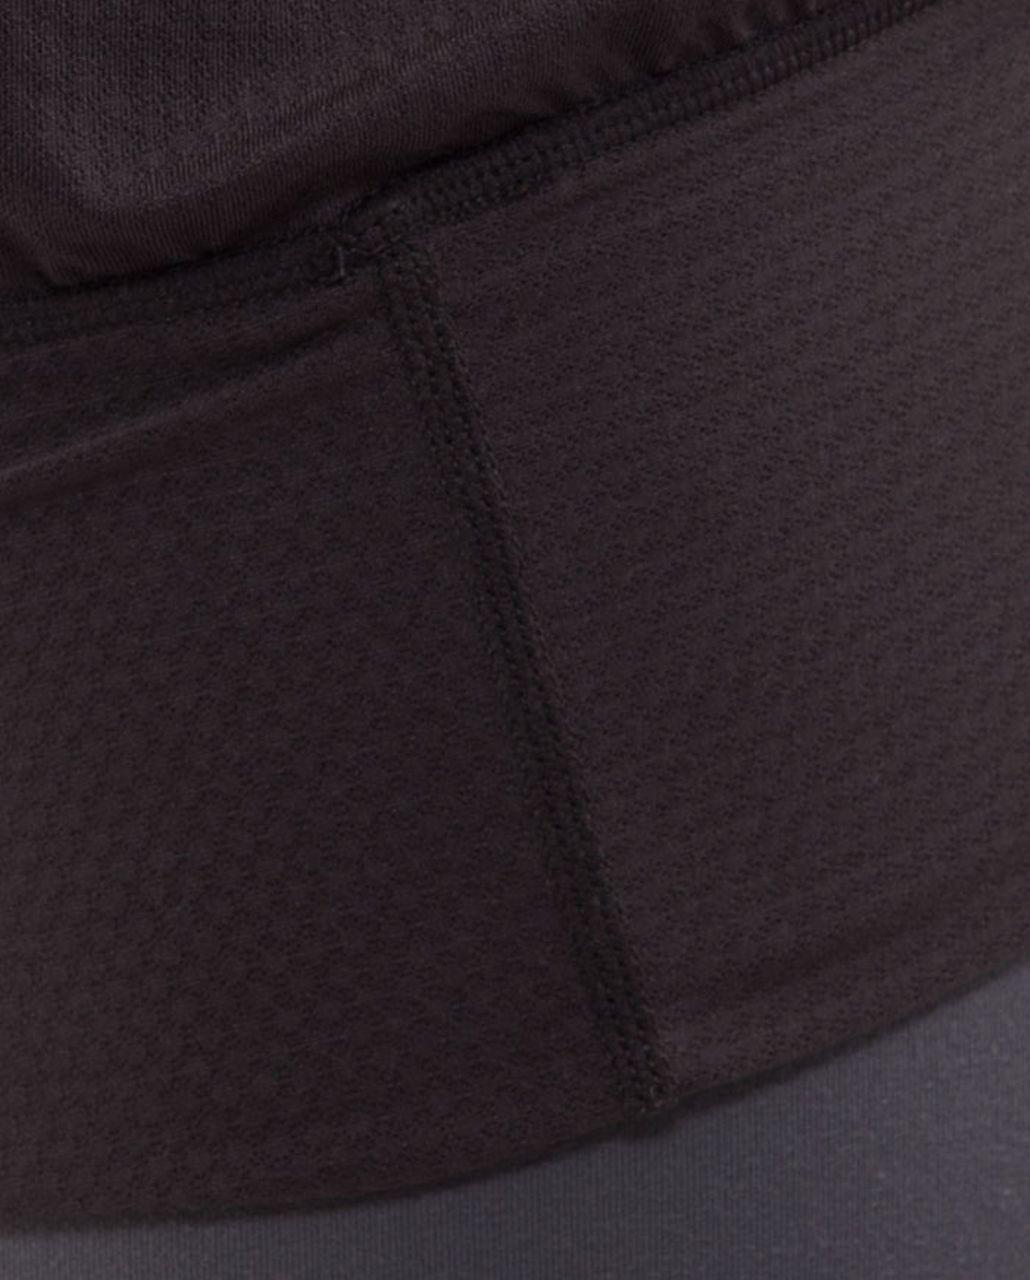 Lululemon No Limit Tank - Charcoal /  White Pinstripe